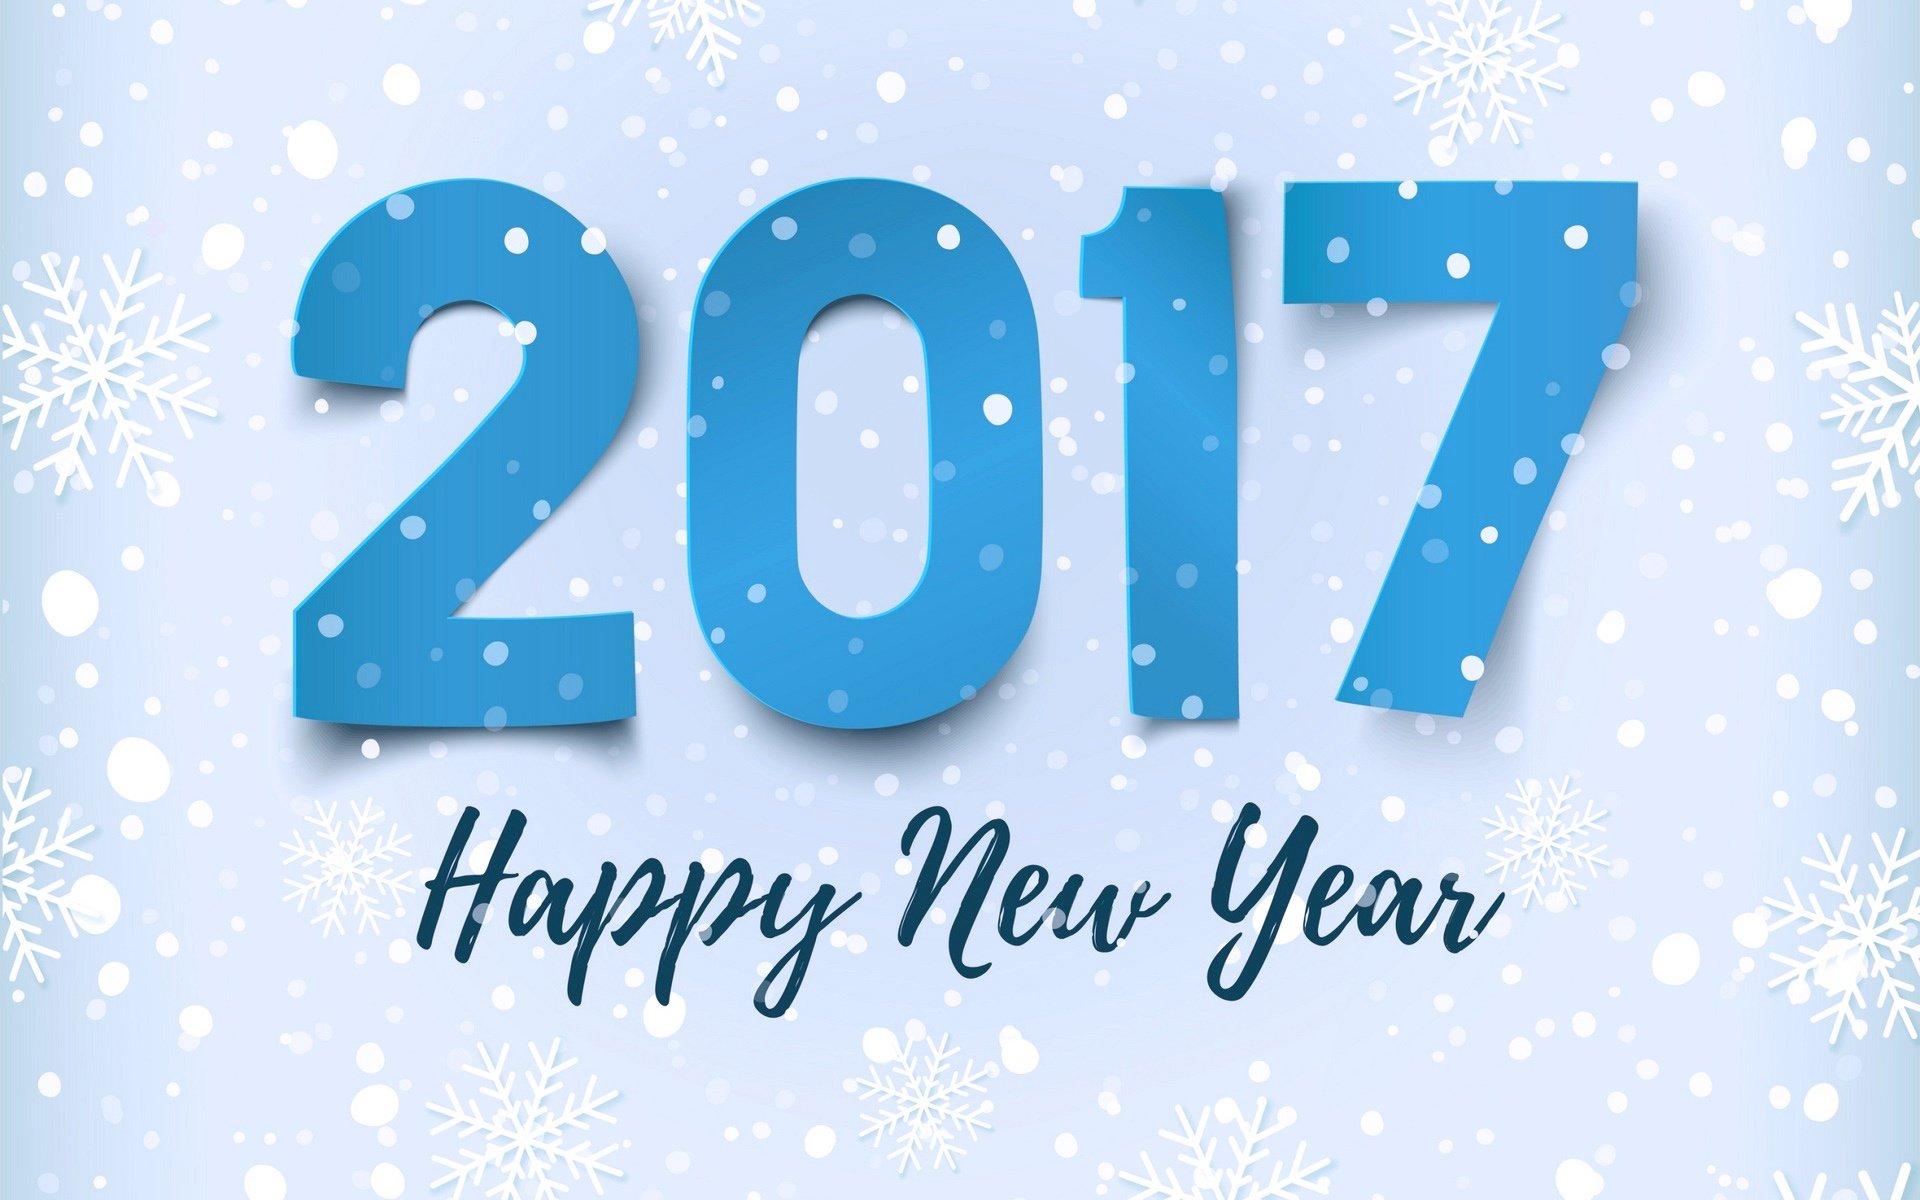 На новый 2017 год новинки музыки 2017